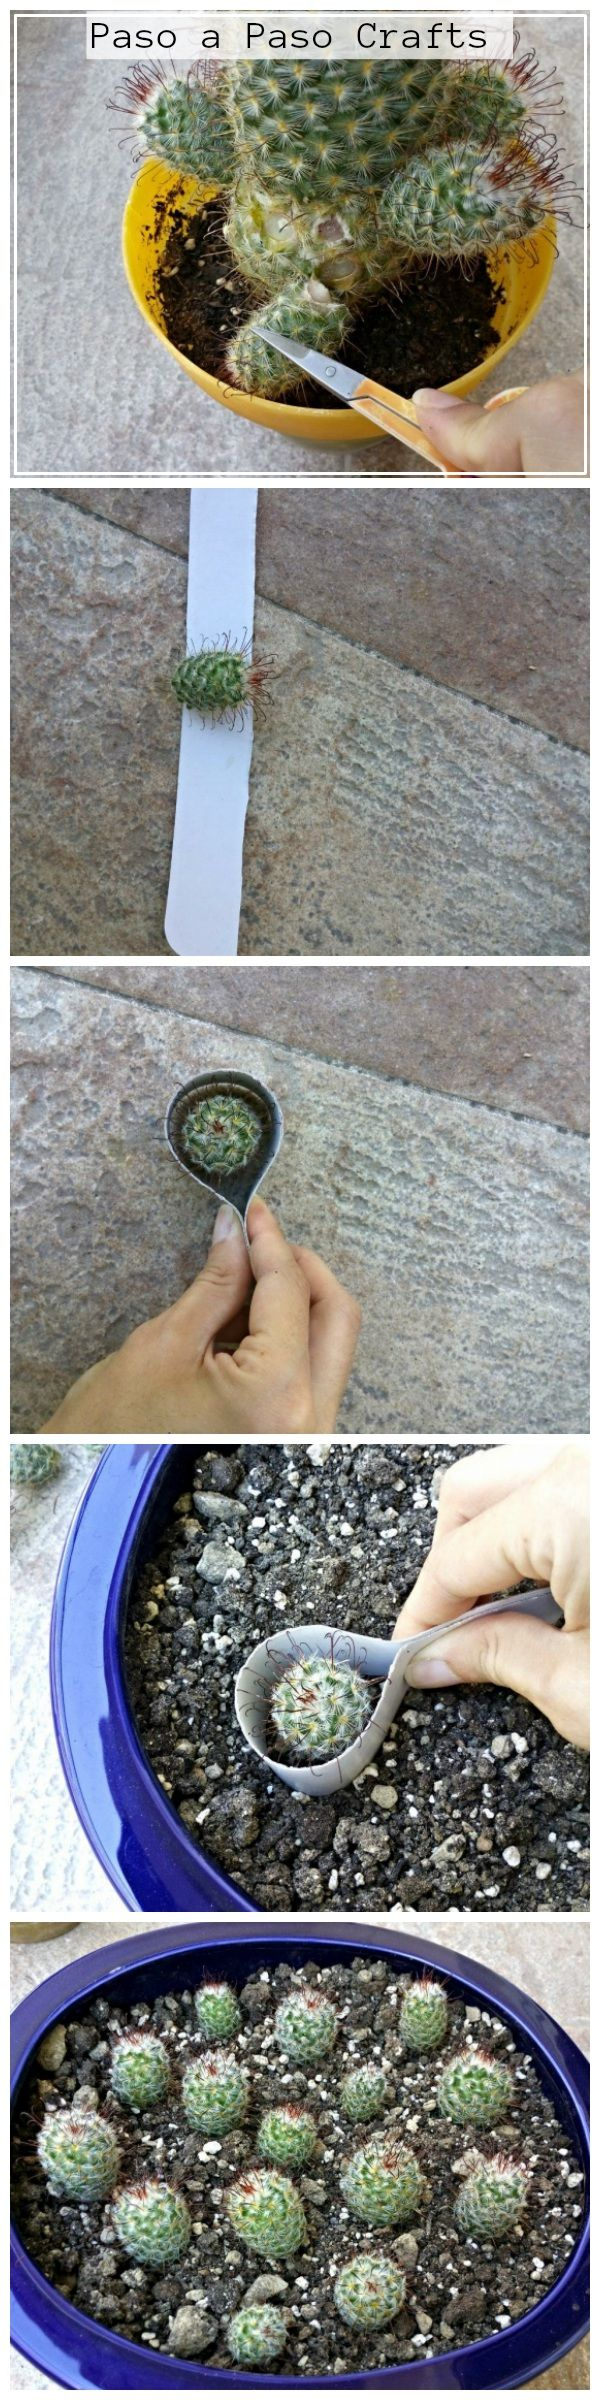 Safe cactus transplantation tutorial